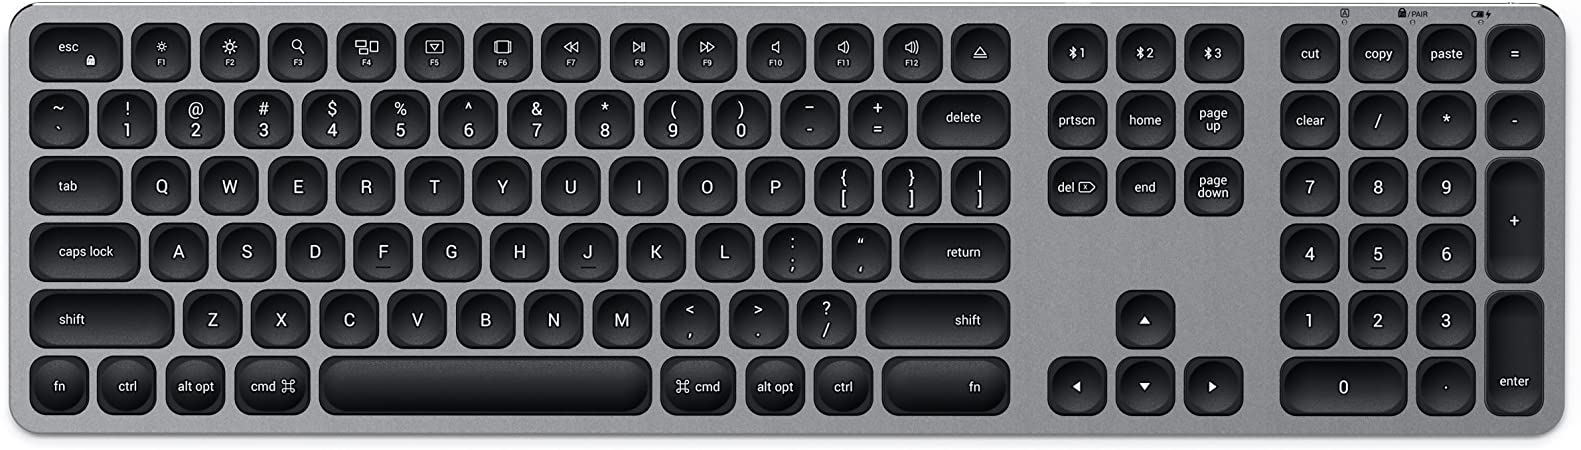 SATECHI Teclado Inalámbrico Bluetooth de Aluminio con Keypad Numérico - Compatible con iMac Pro/iMac, Mac Mini, 2020/2019/2018 MacBook Pro, 2020/2018 ...